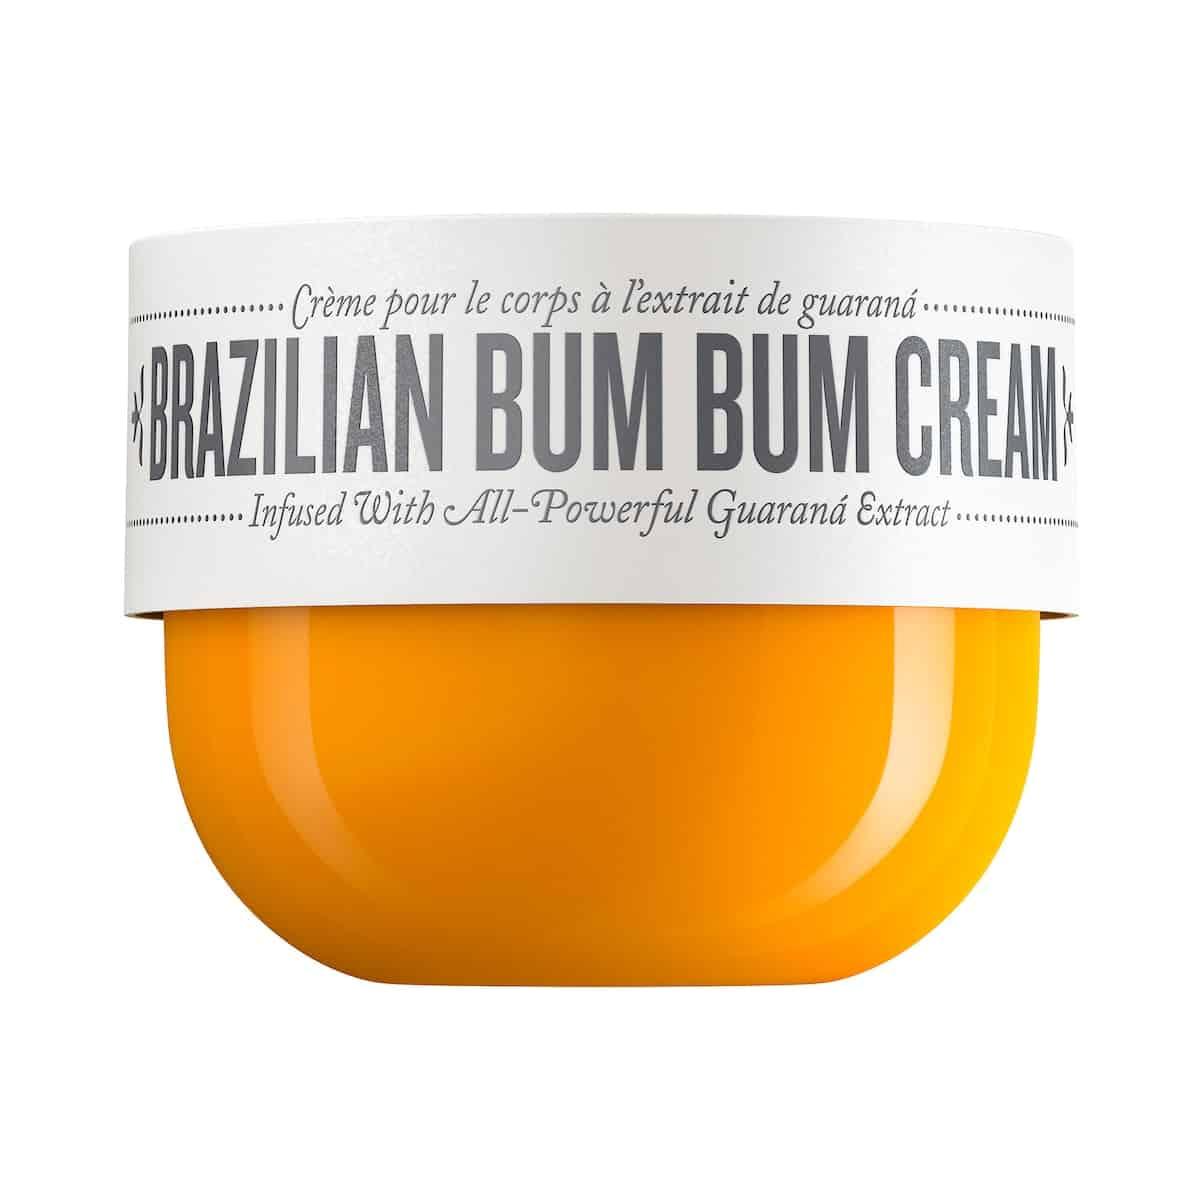 Brazilian Bum Bum Cream, Sol de Janeiro